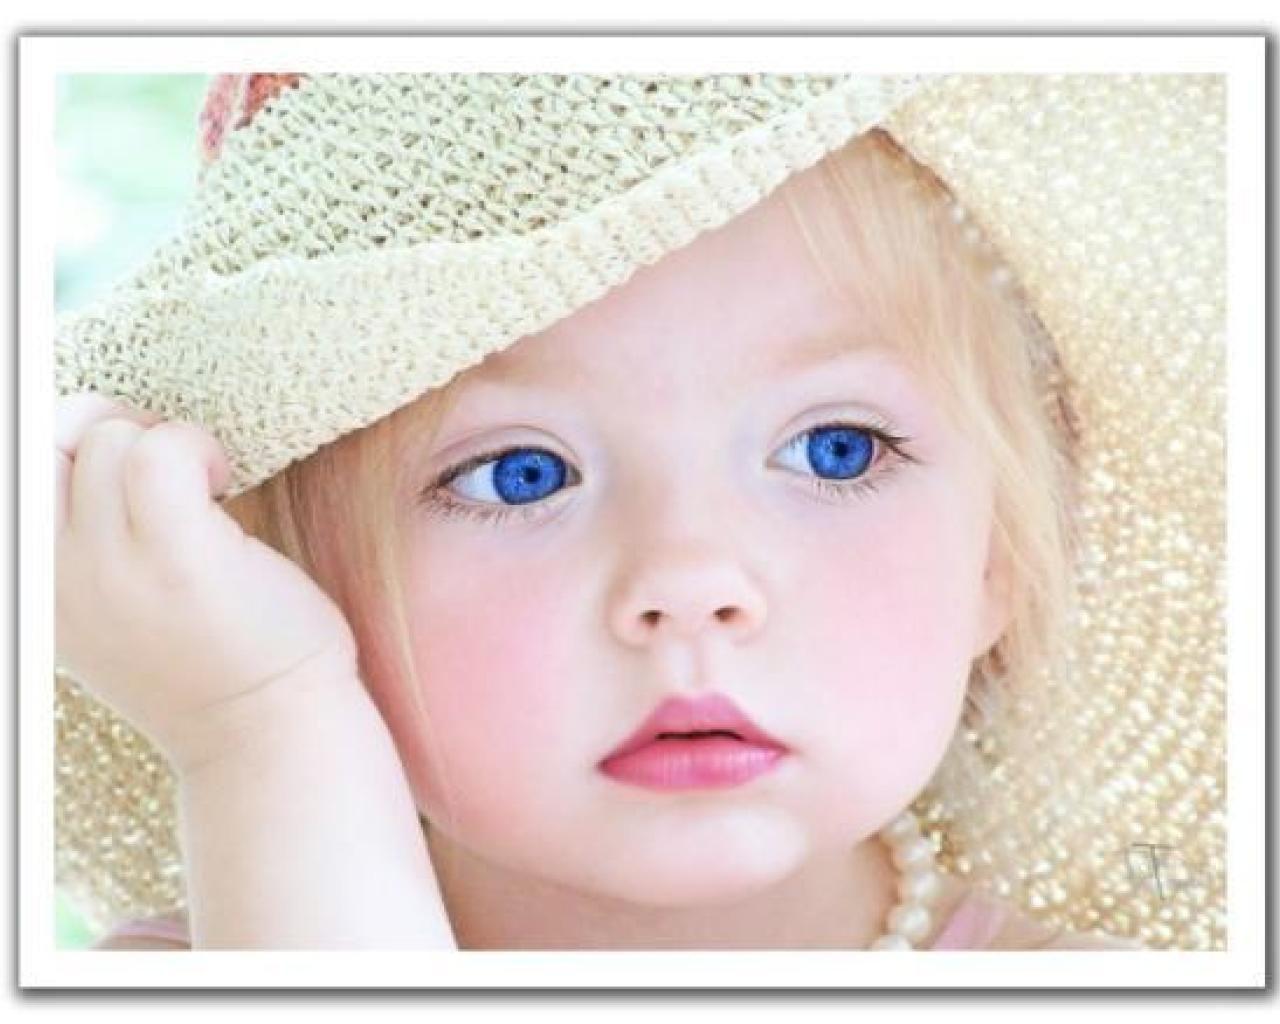 Beautiful Babies Wallpapers Baby Girl Wallpaper Cute Baby Wallpaper Cute Baby Pictures